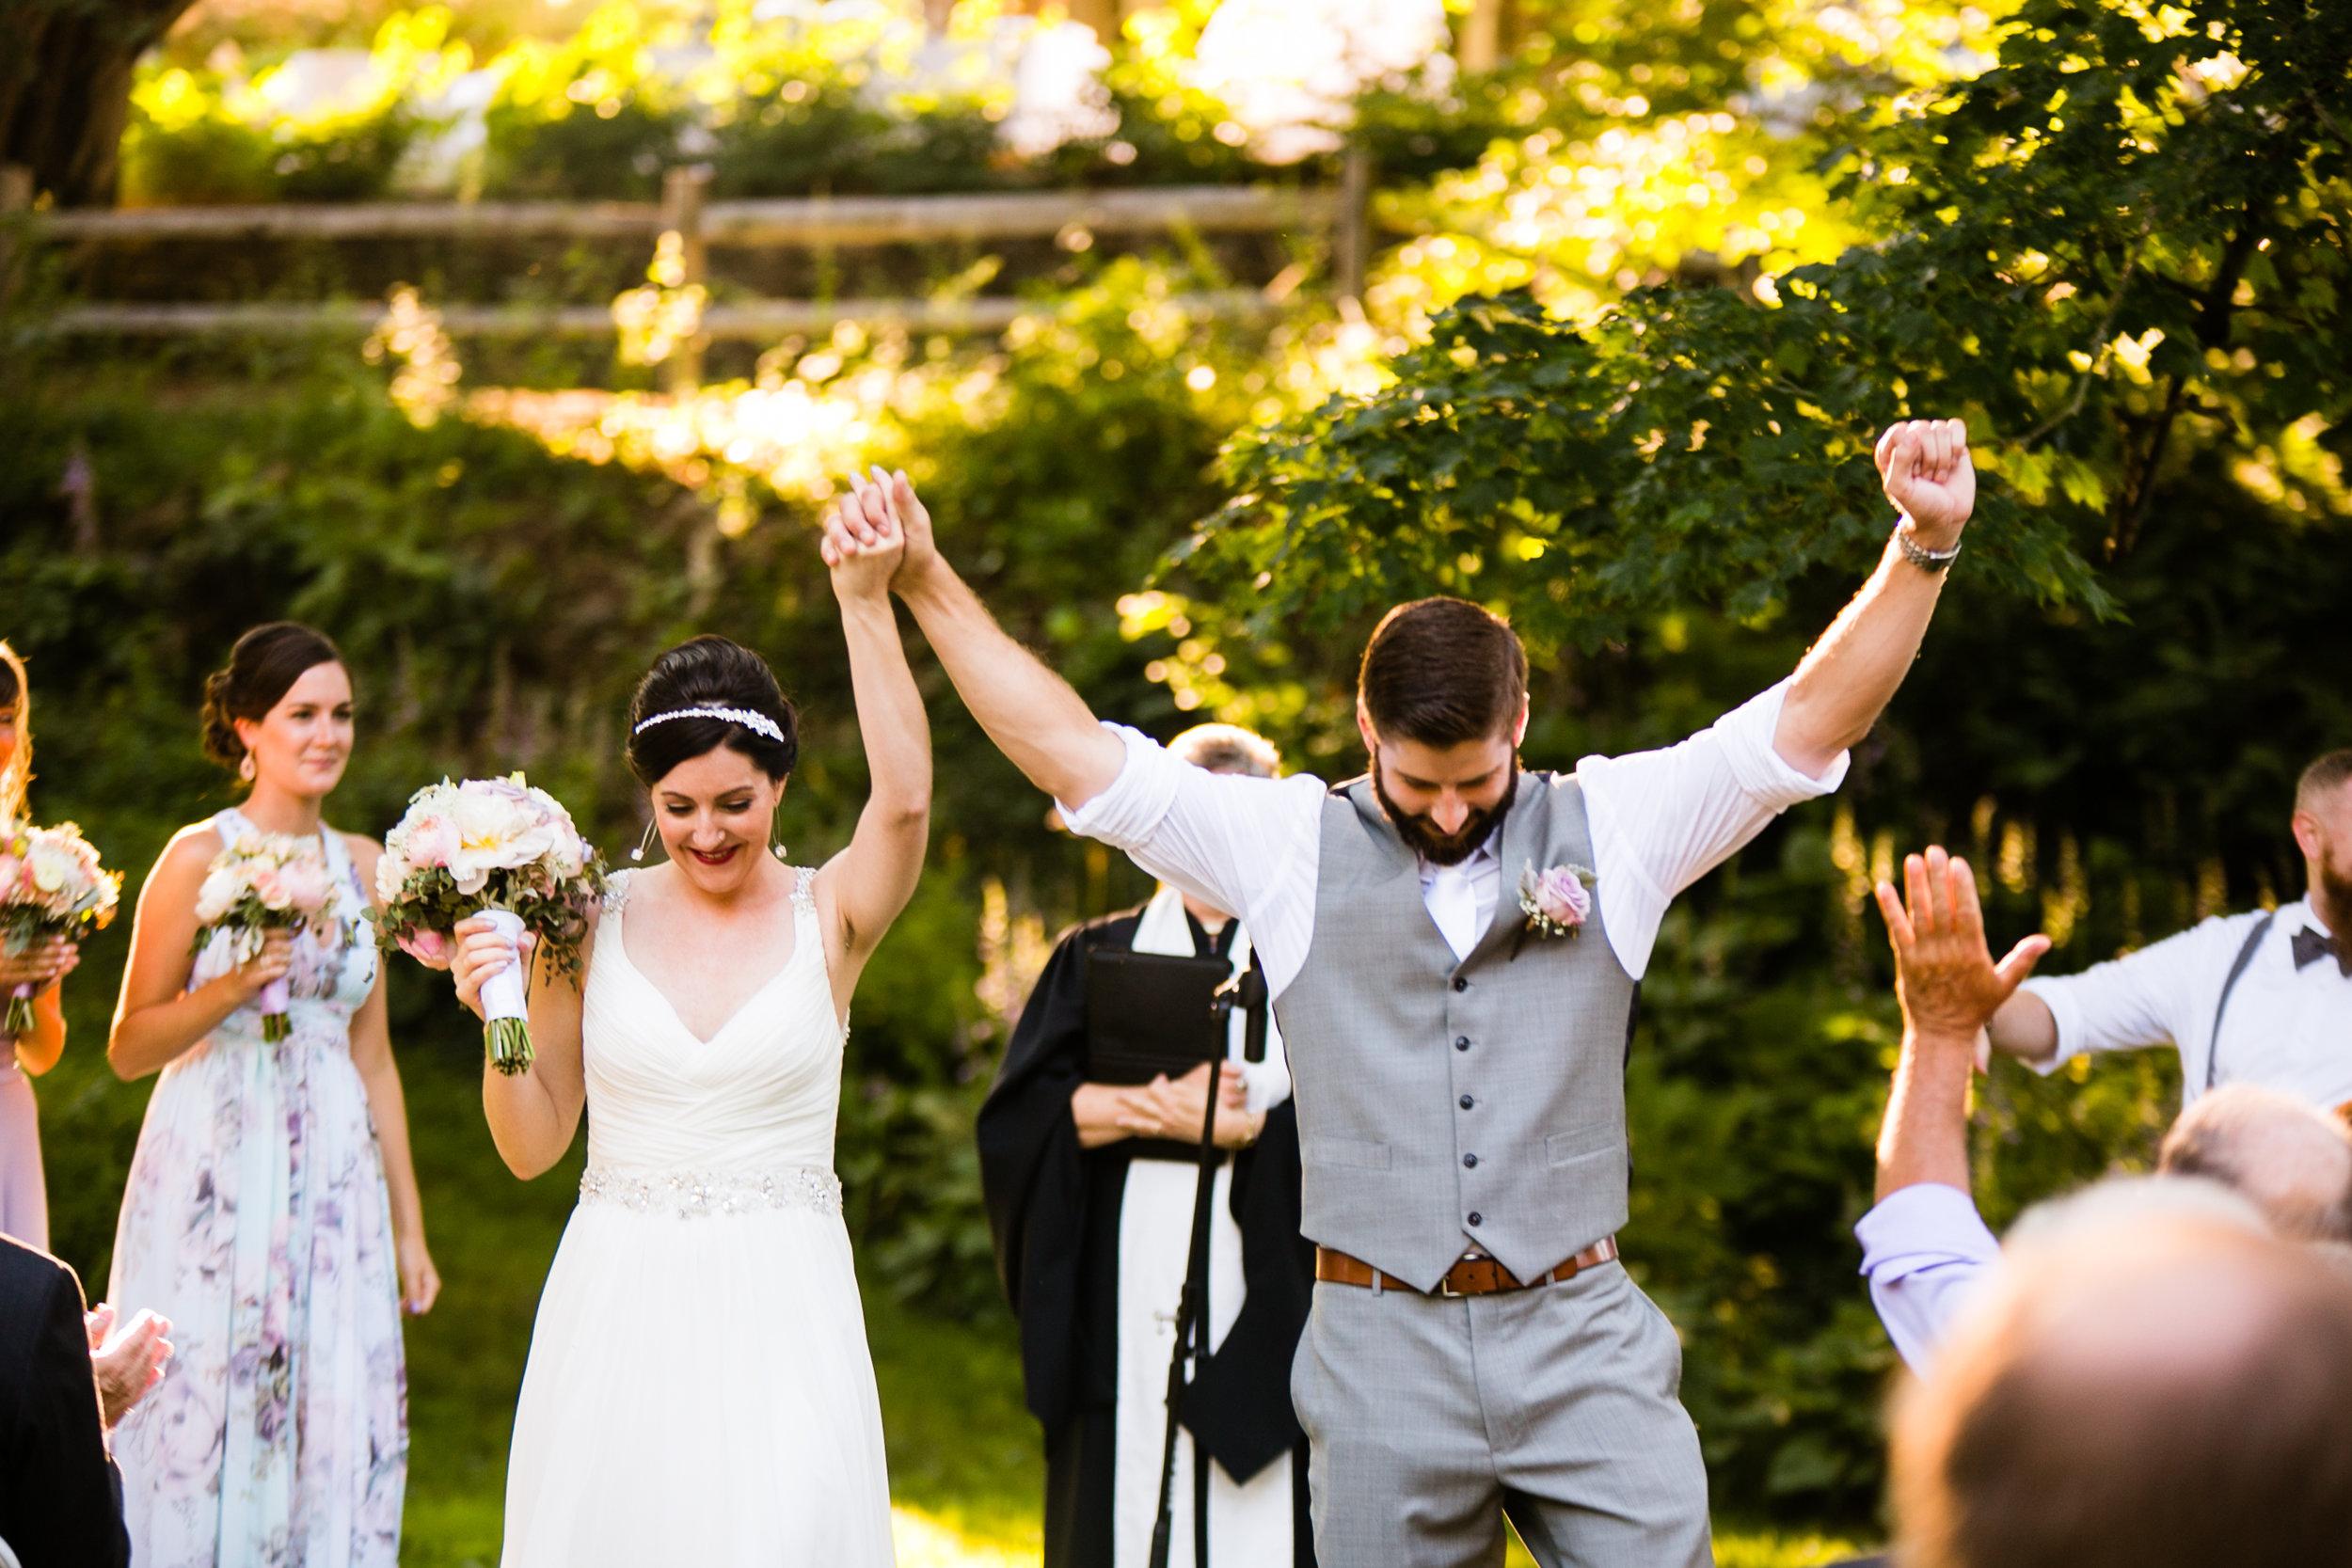 TYLER ARBORETUM WEDDING PHOTOGRAPHY LOVESTRUCK PICTURES-063.jpg